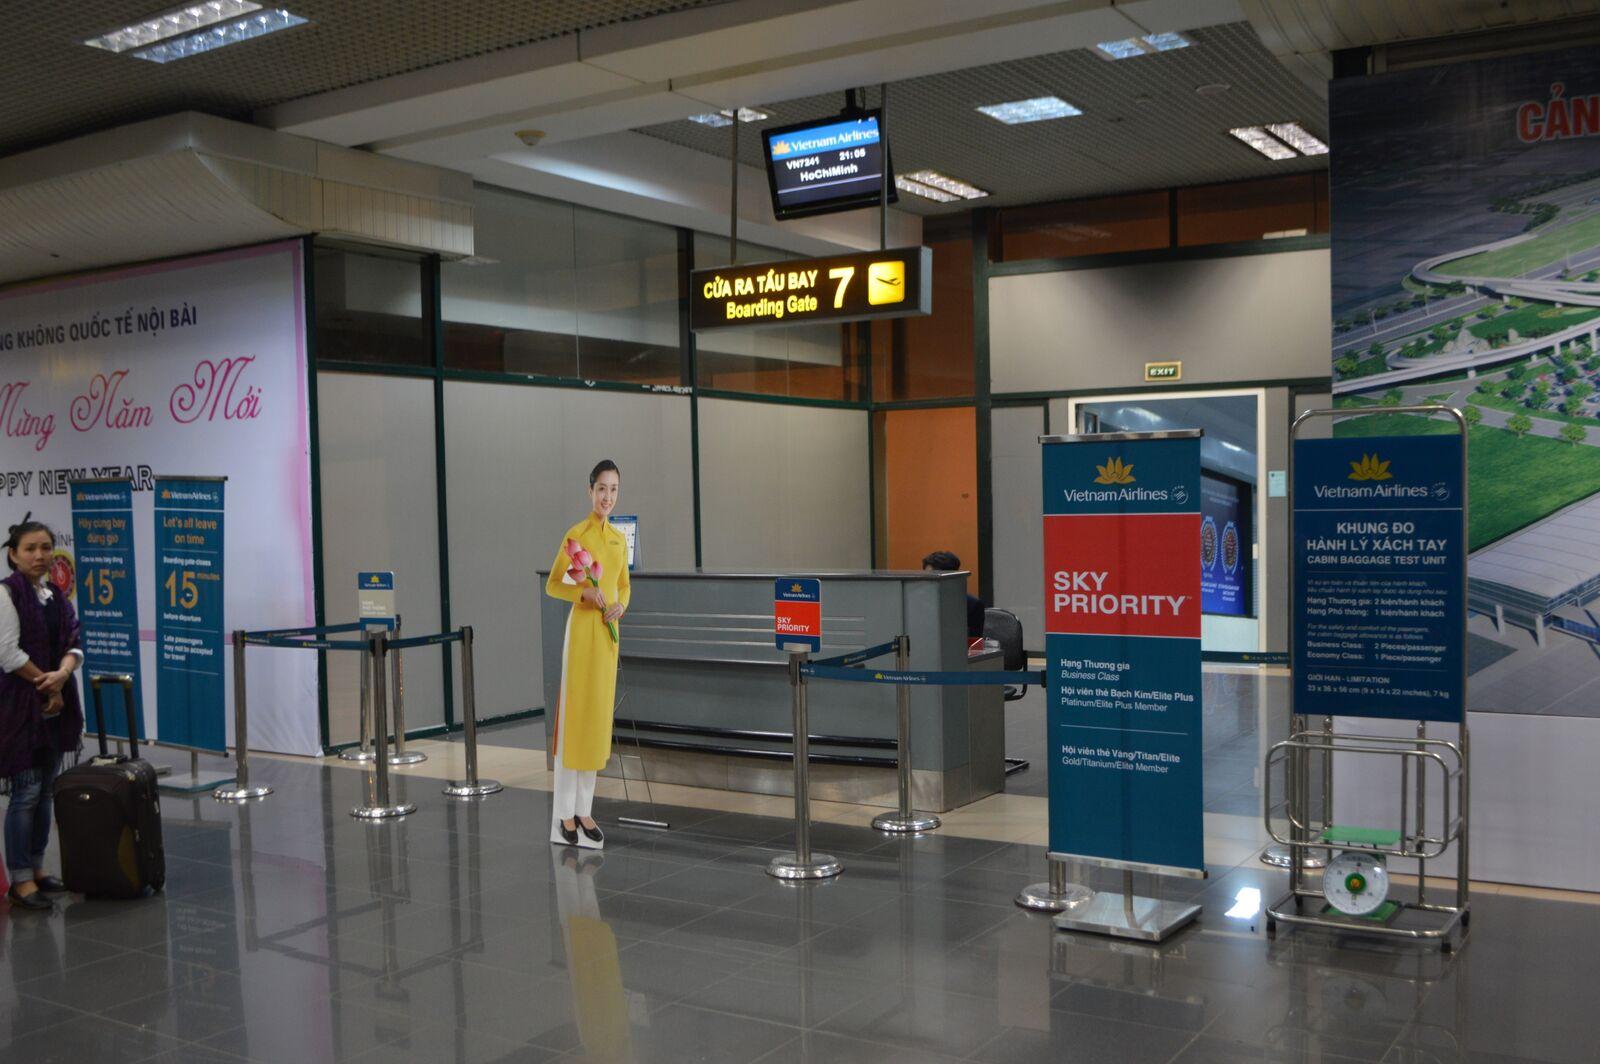 Snart klar til boarding. Foto: Jens Fisker